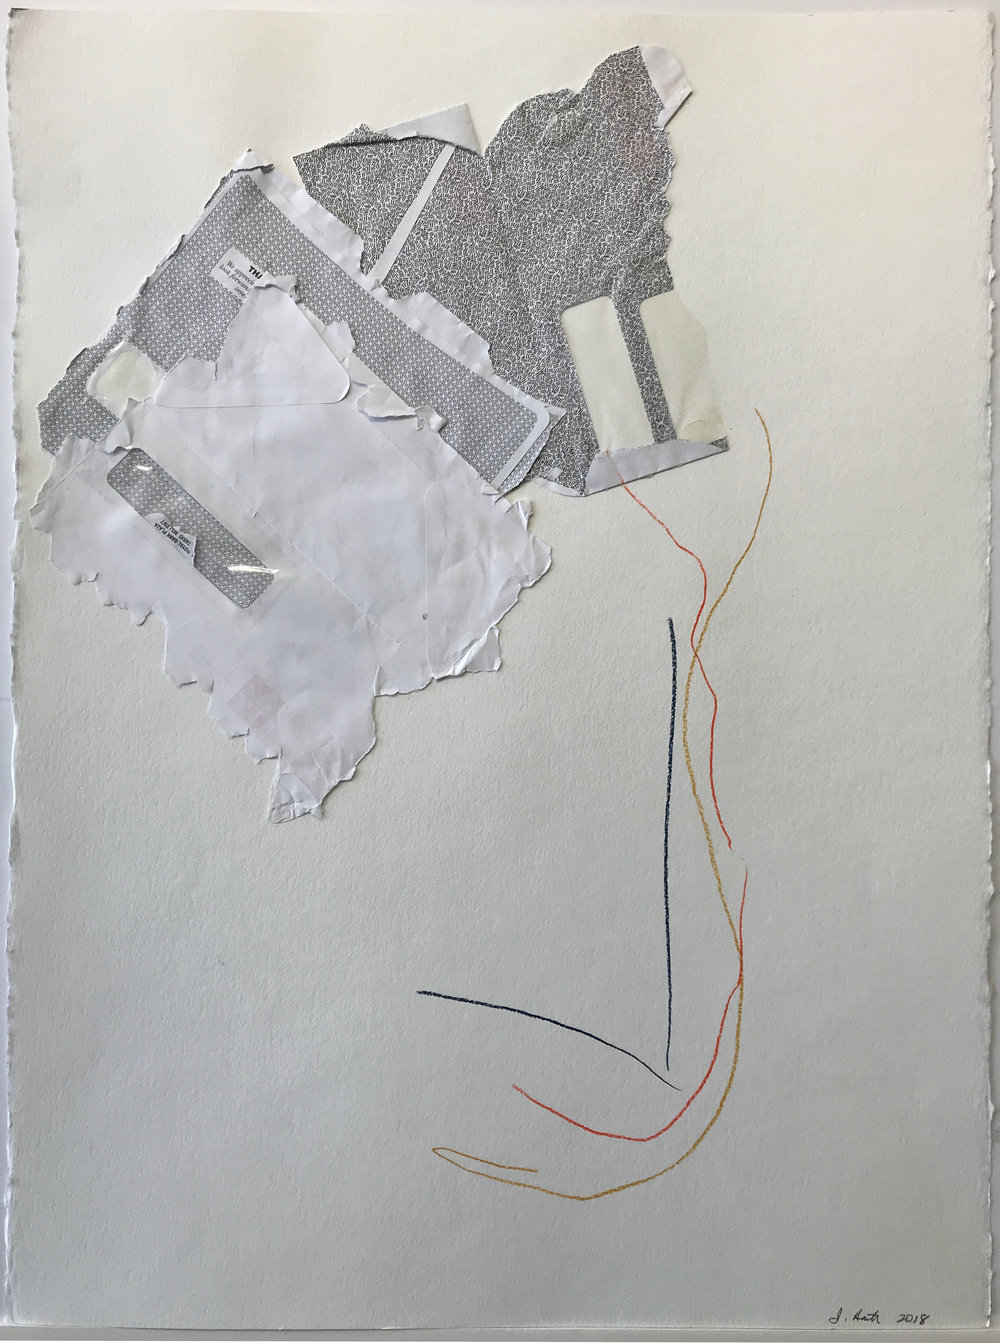 Works on Paper — Nikola Rukaj Gallery